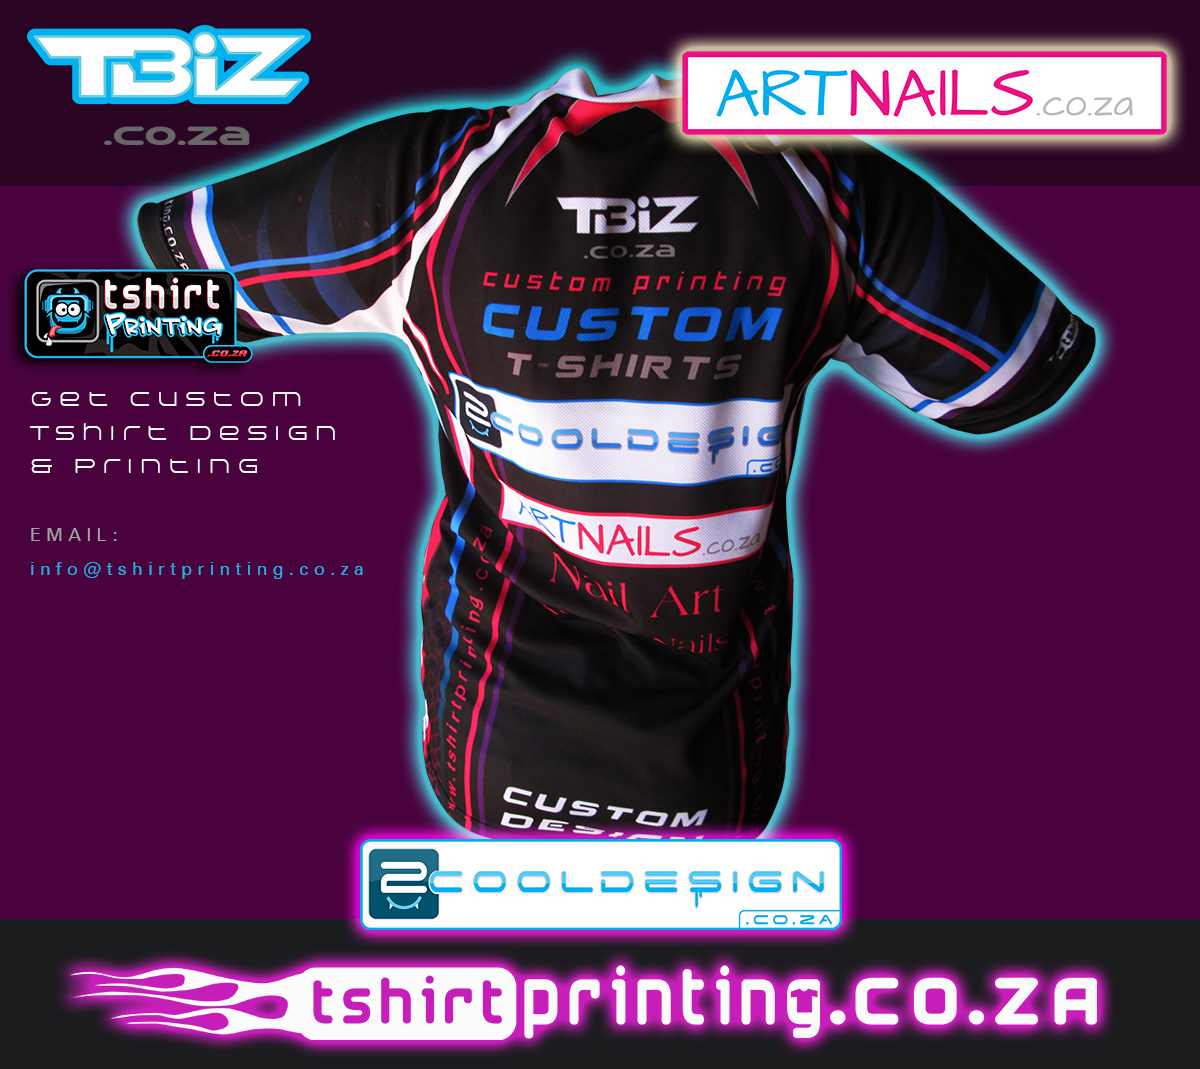 T shirt design za - Girls All Over Shirt Printing